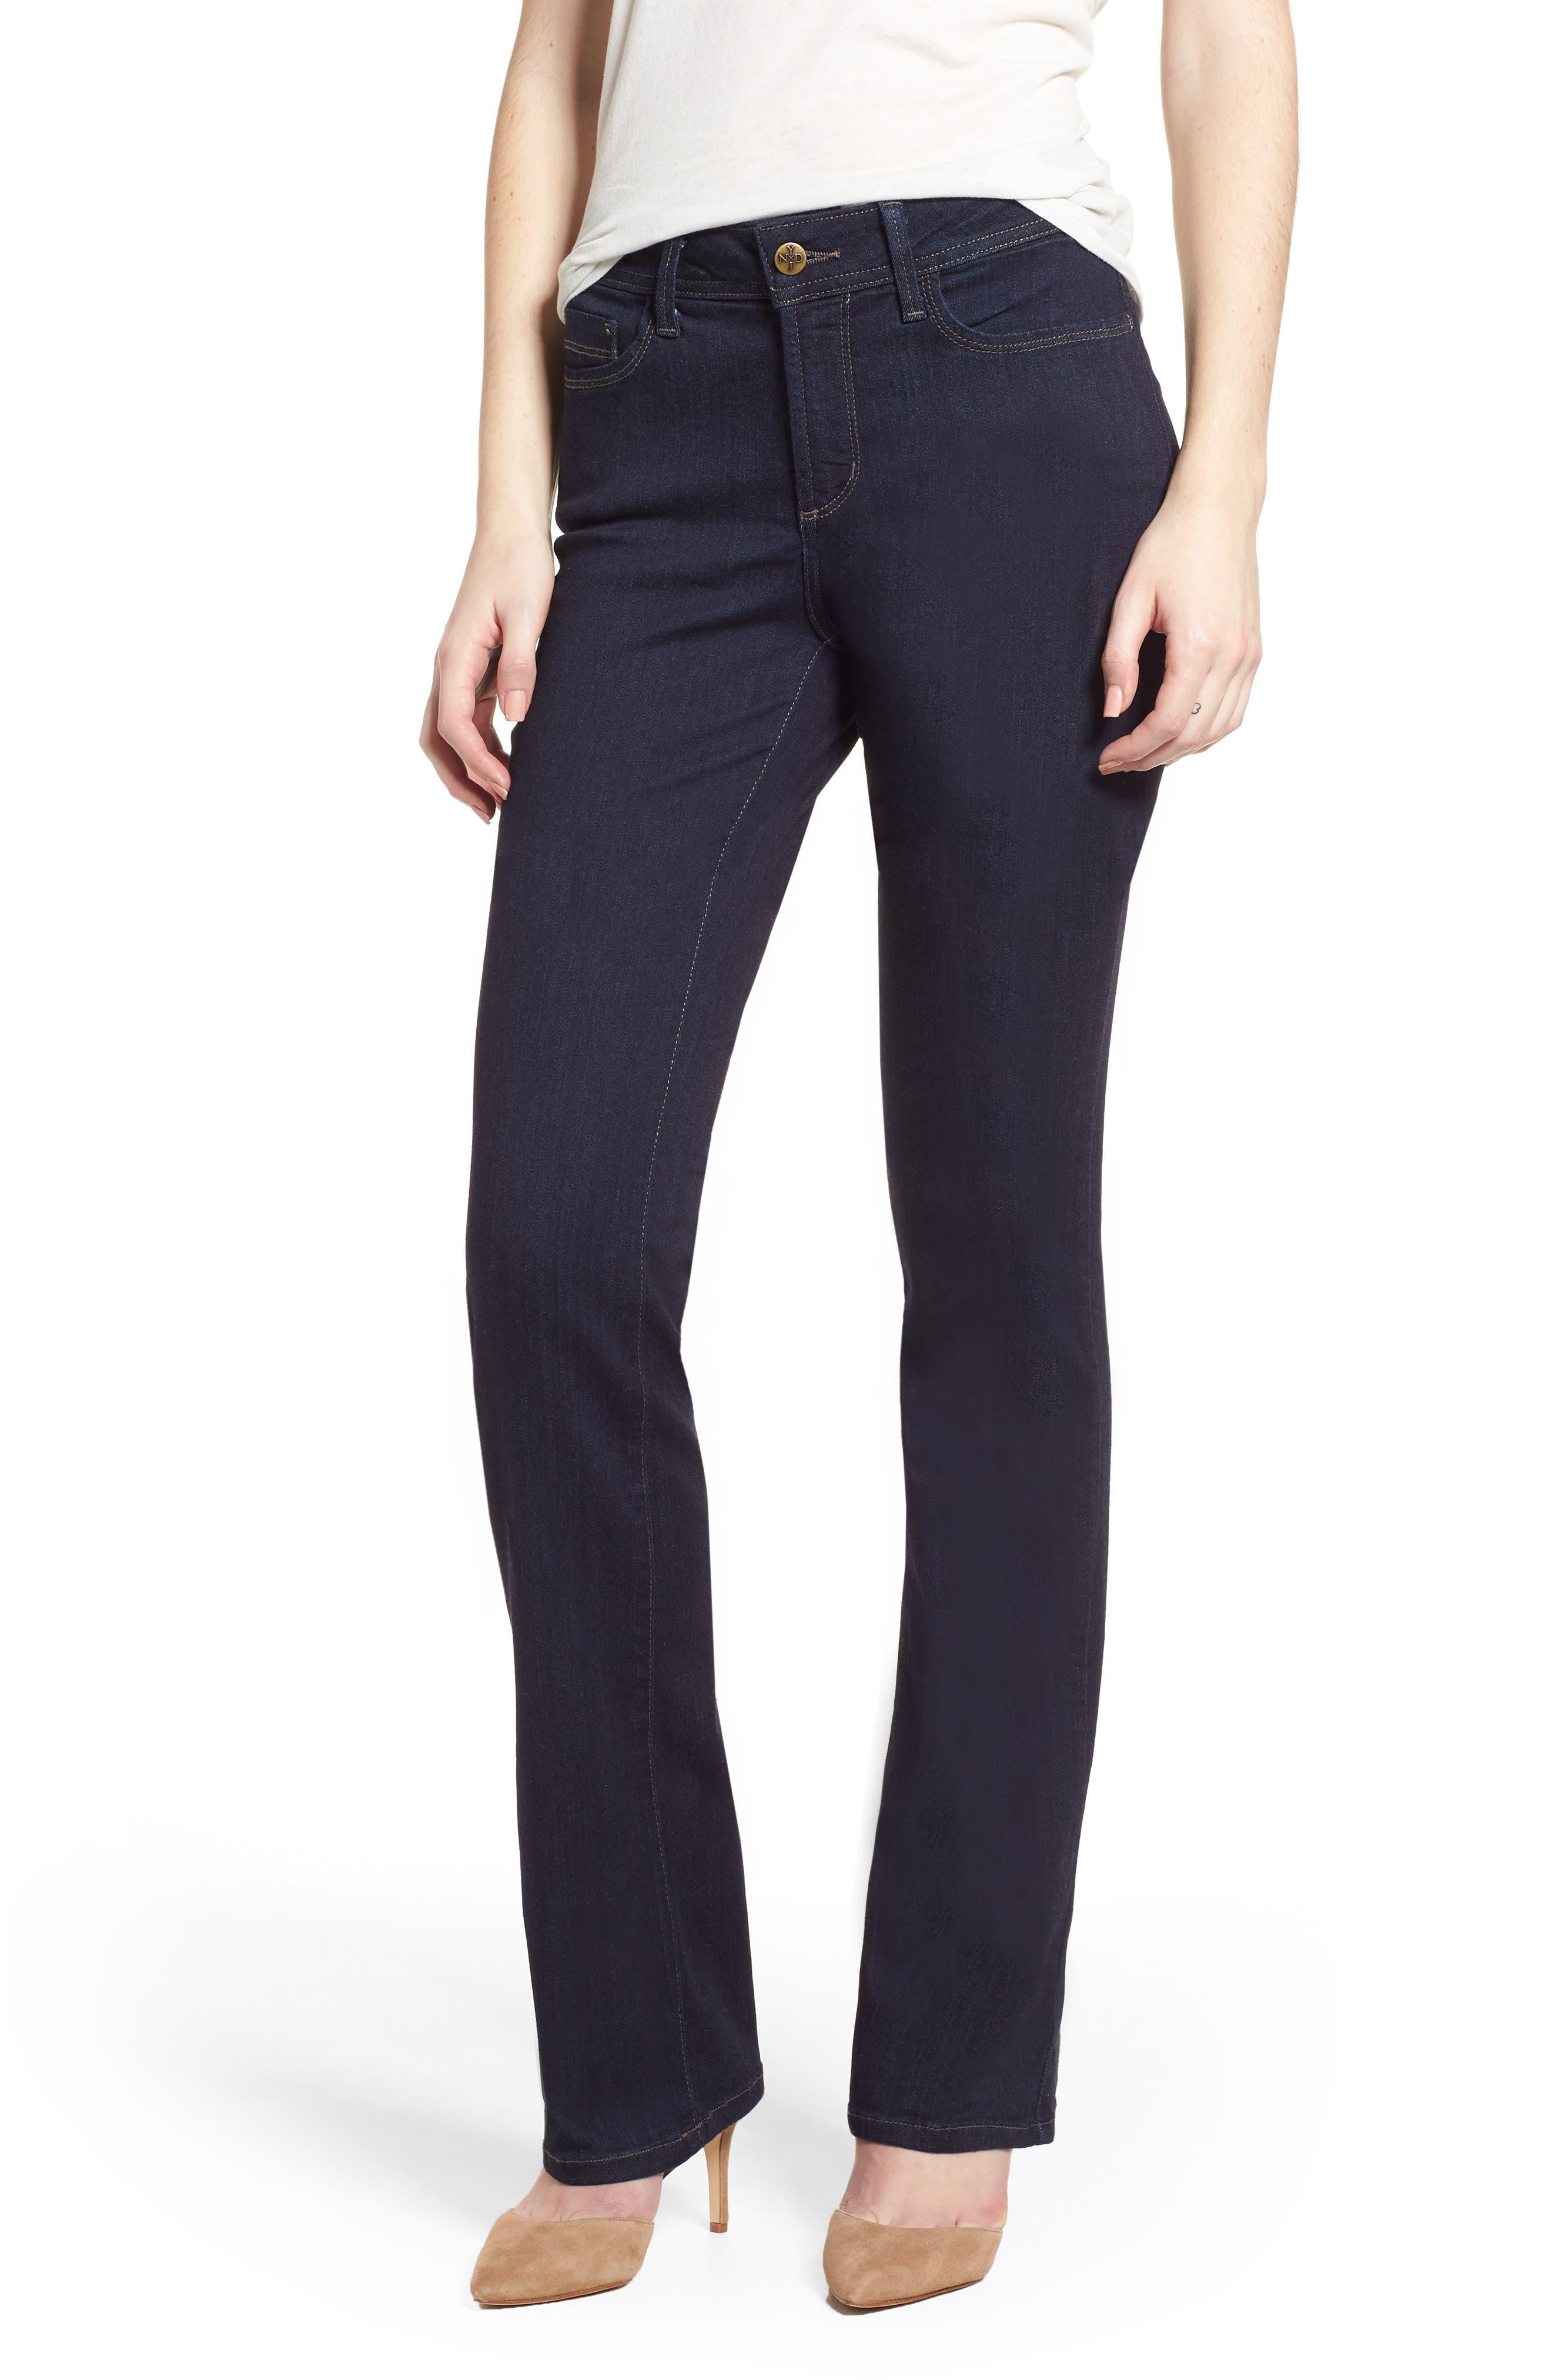 Billie Mini Bootcut Jeans,                             Main thumbnail 1, color,                             Mabel